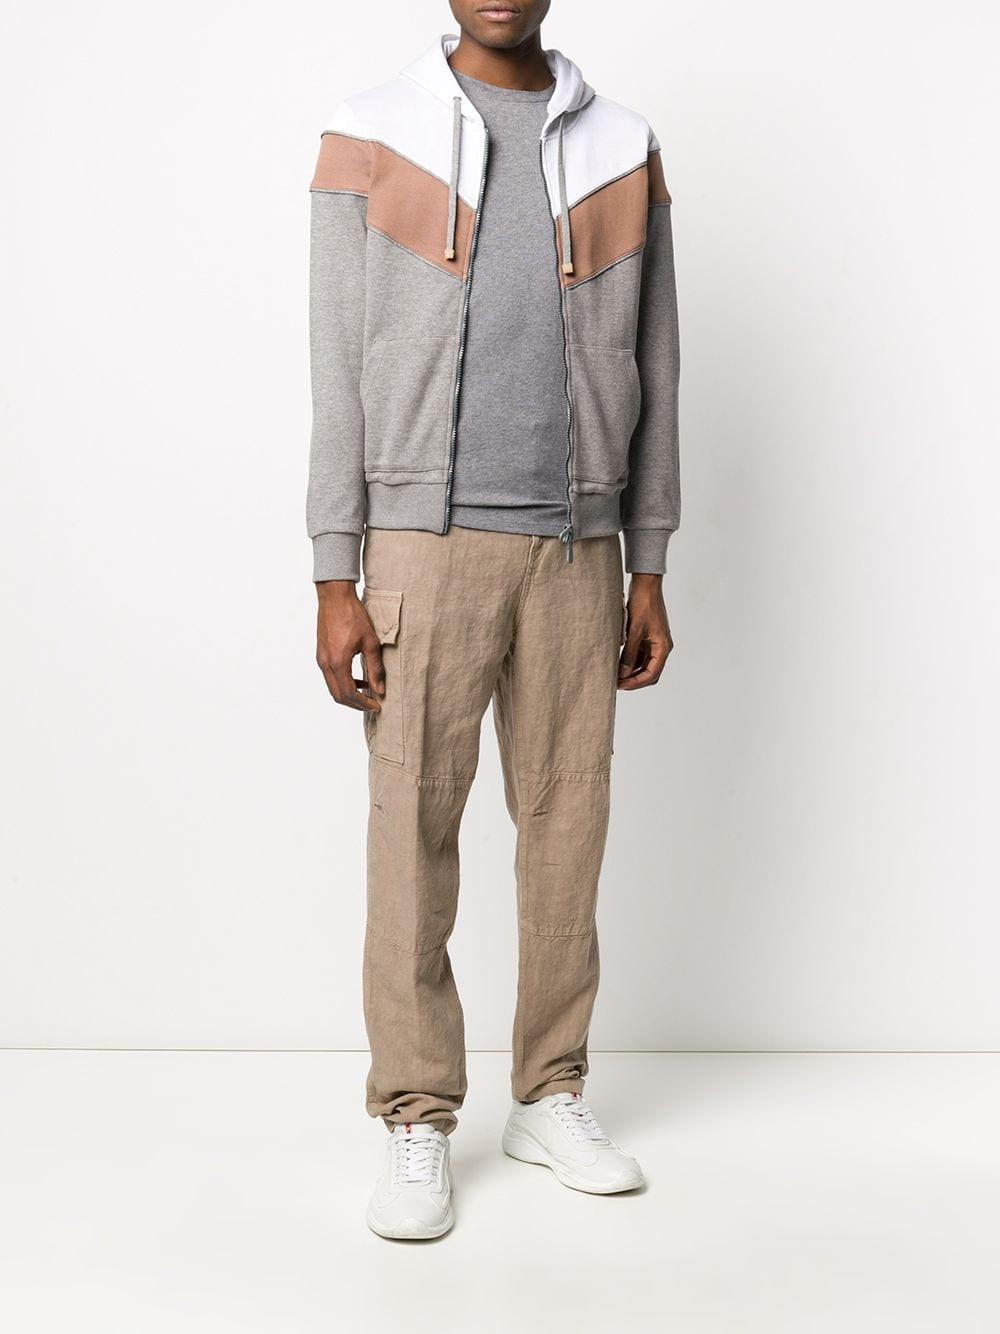 Pantaloni a gamba dritta in lino beige con tasche laterali ELEVENTY   Pantaloni   A75PANA15-TET0A01003